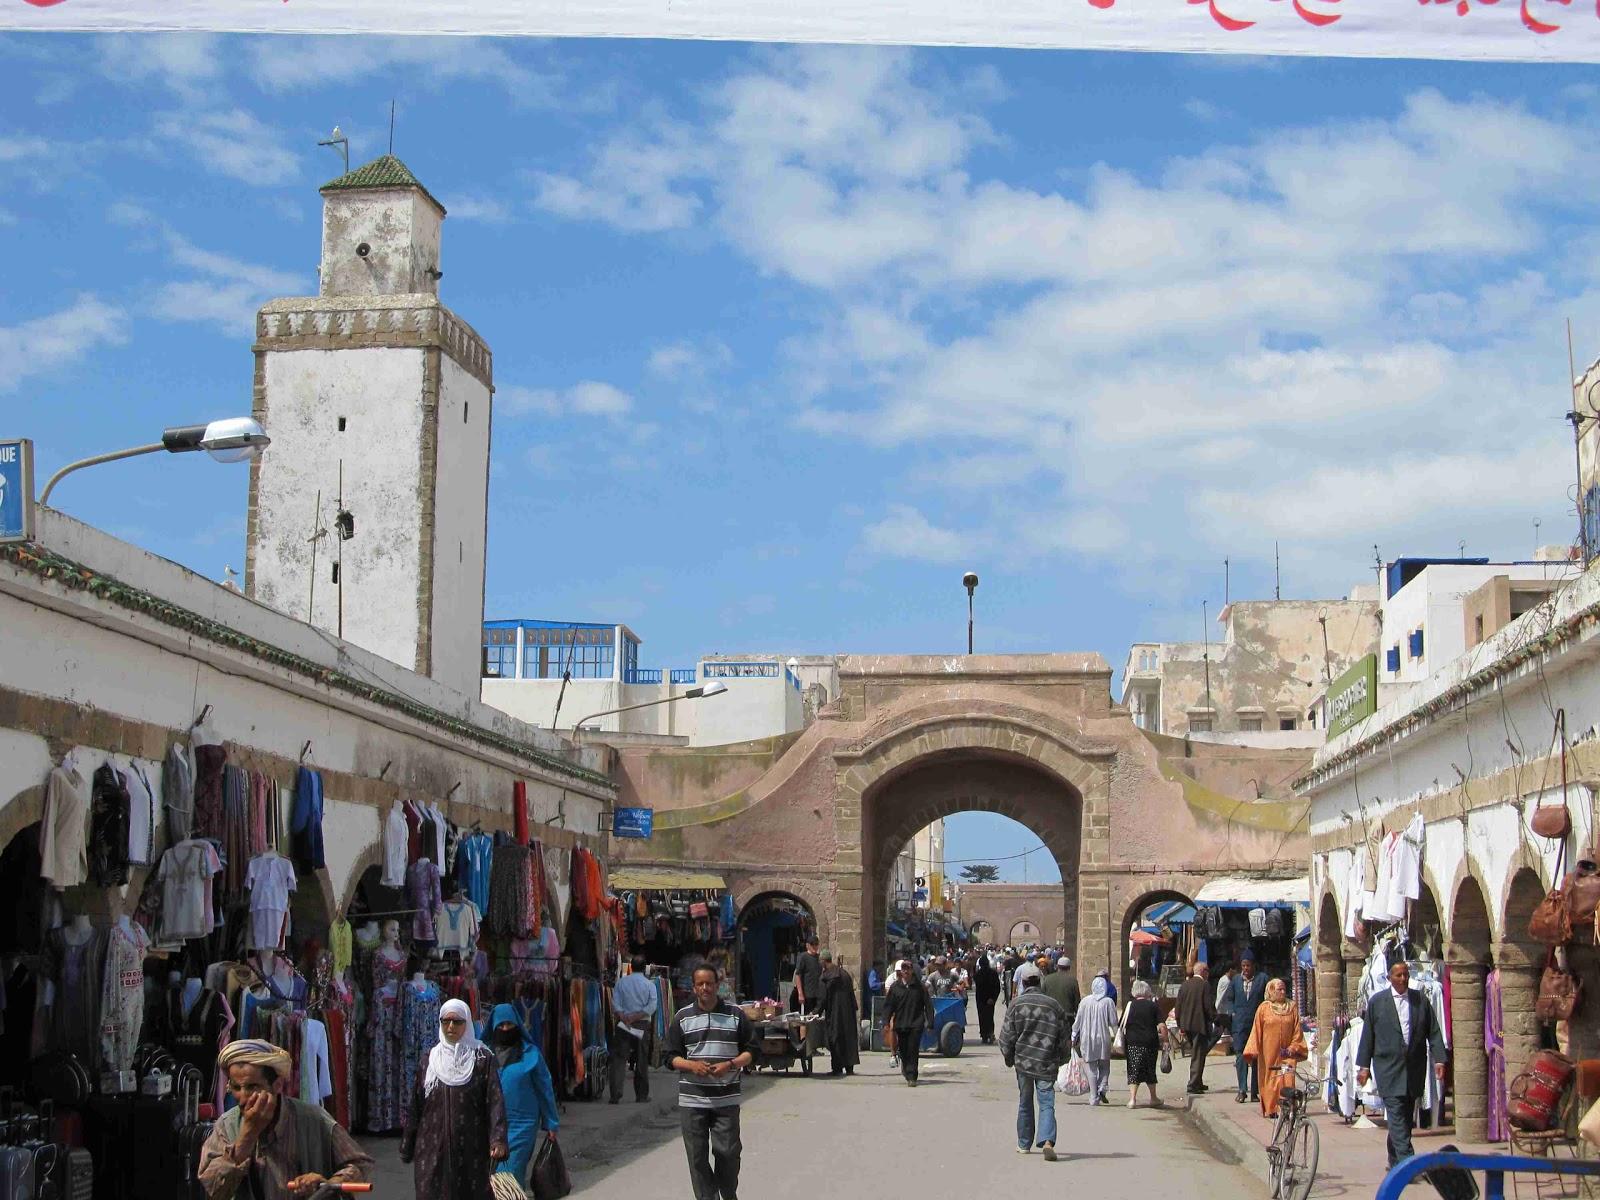 http://3.bp.blogspot.com/-37BsOz0B-AY/Te9HZxdi8dI/AAAAAAAAC2s/Y0ZW6e5iX60/s1600/essaouira+medina+wall.jpg